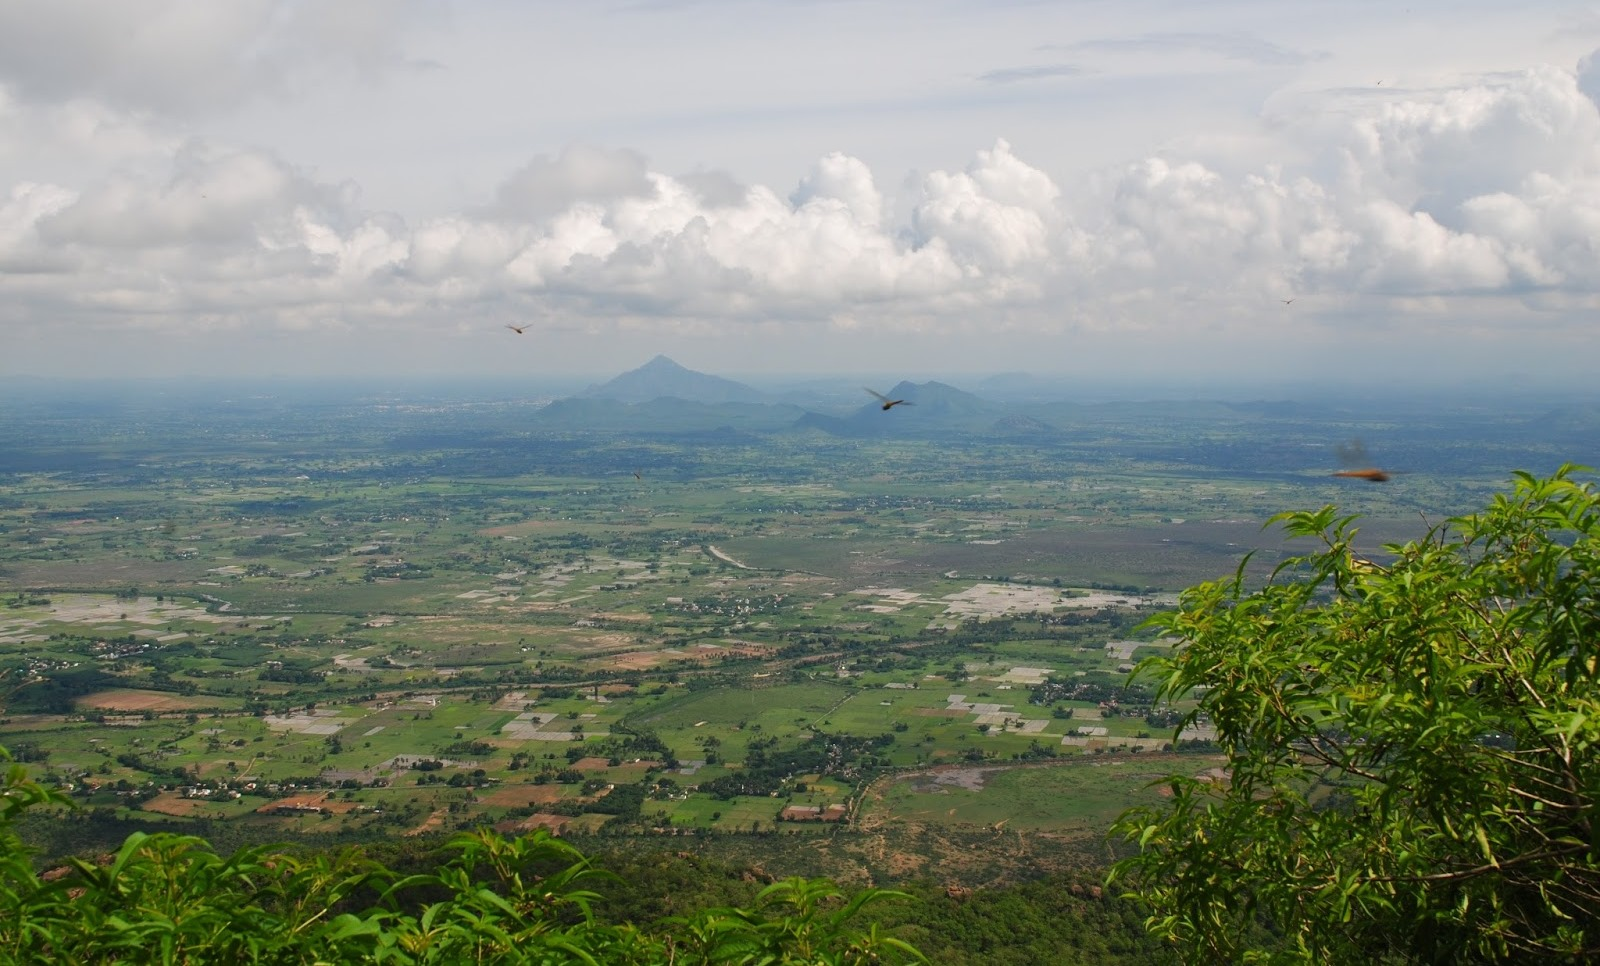 Tamilnadu Tourism: Parvathamalai, Thiruvannamalai